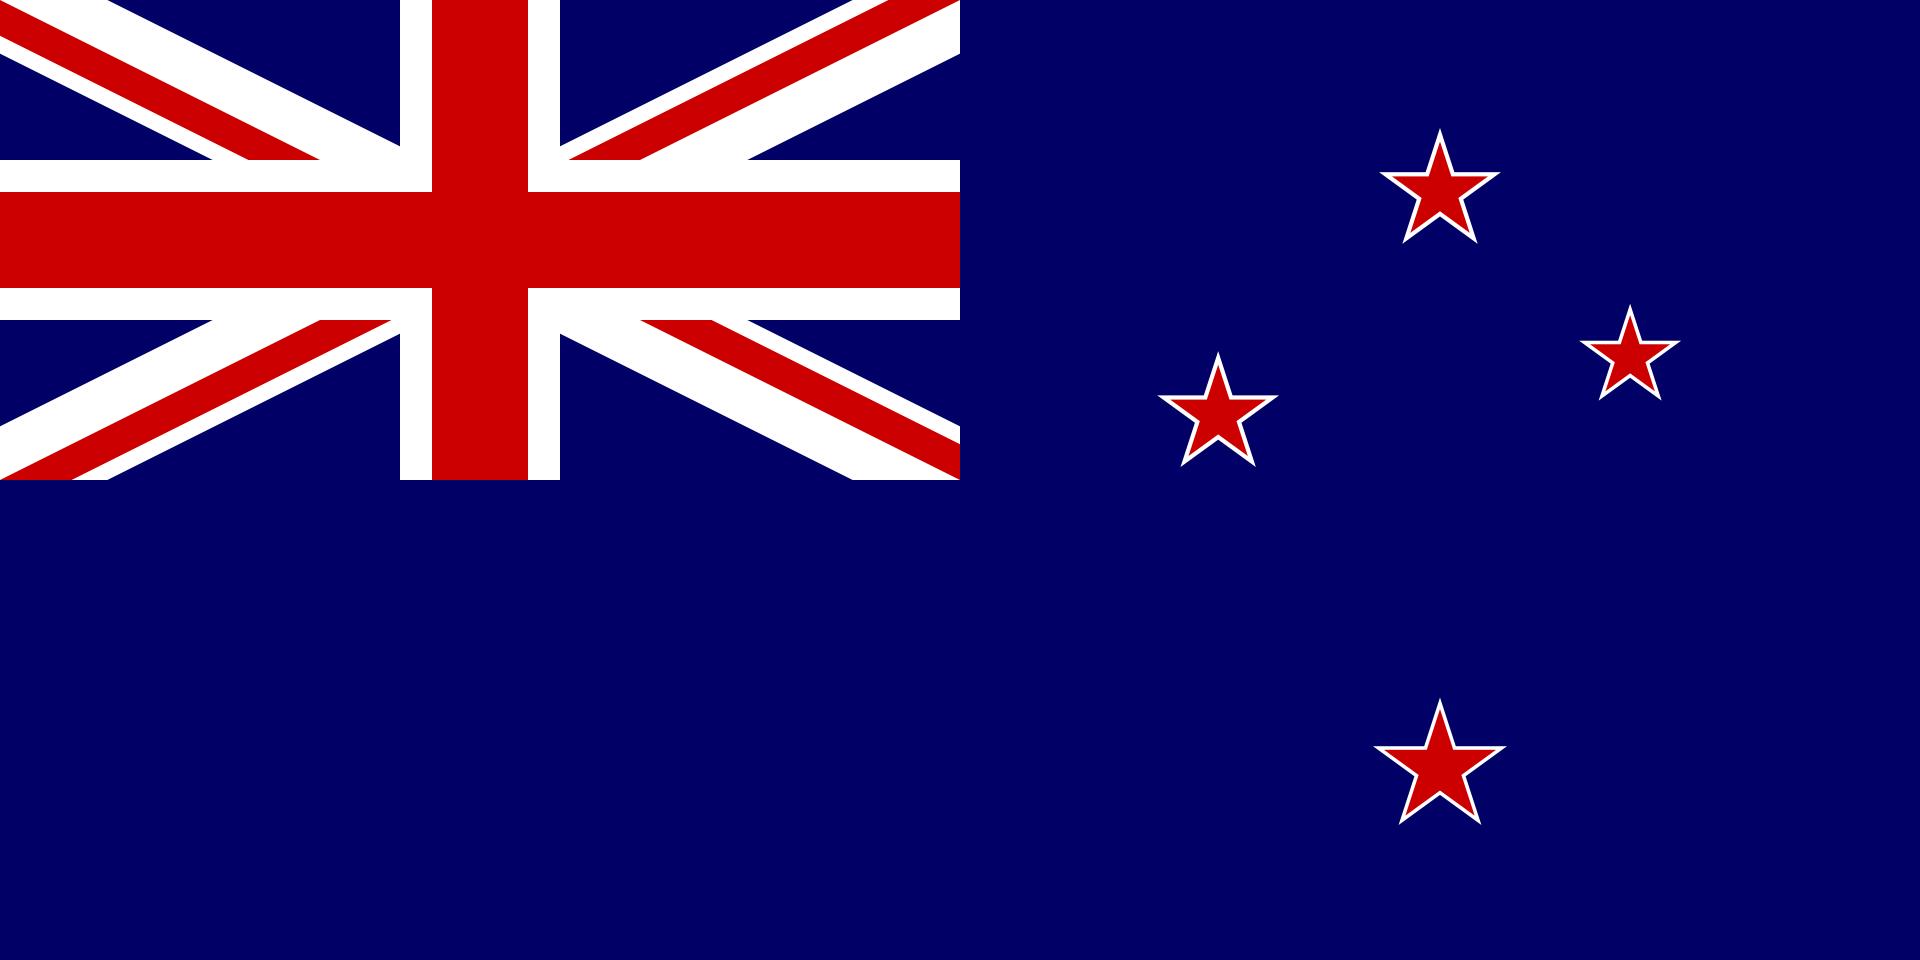 VIDEO: Građani Novog Zelanda zadržali staru zastavu